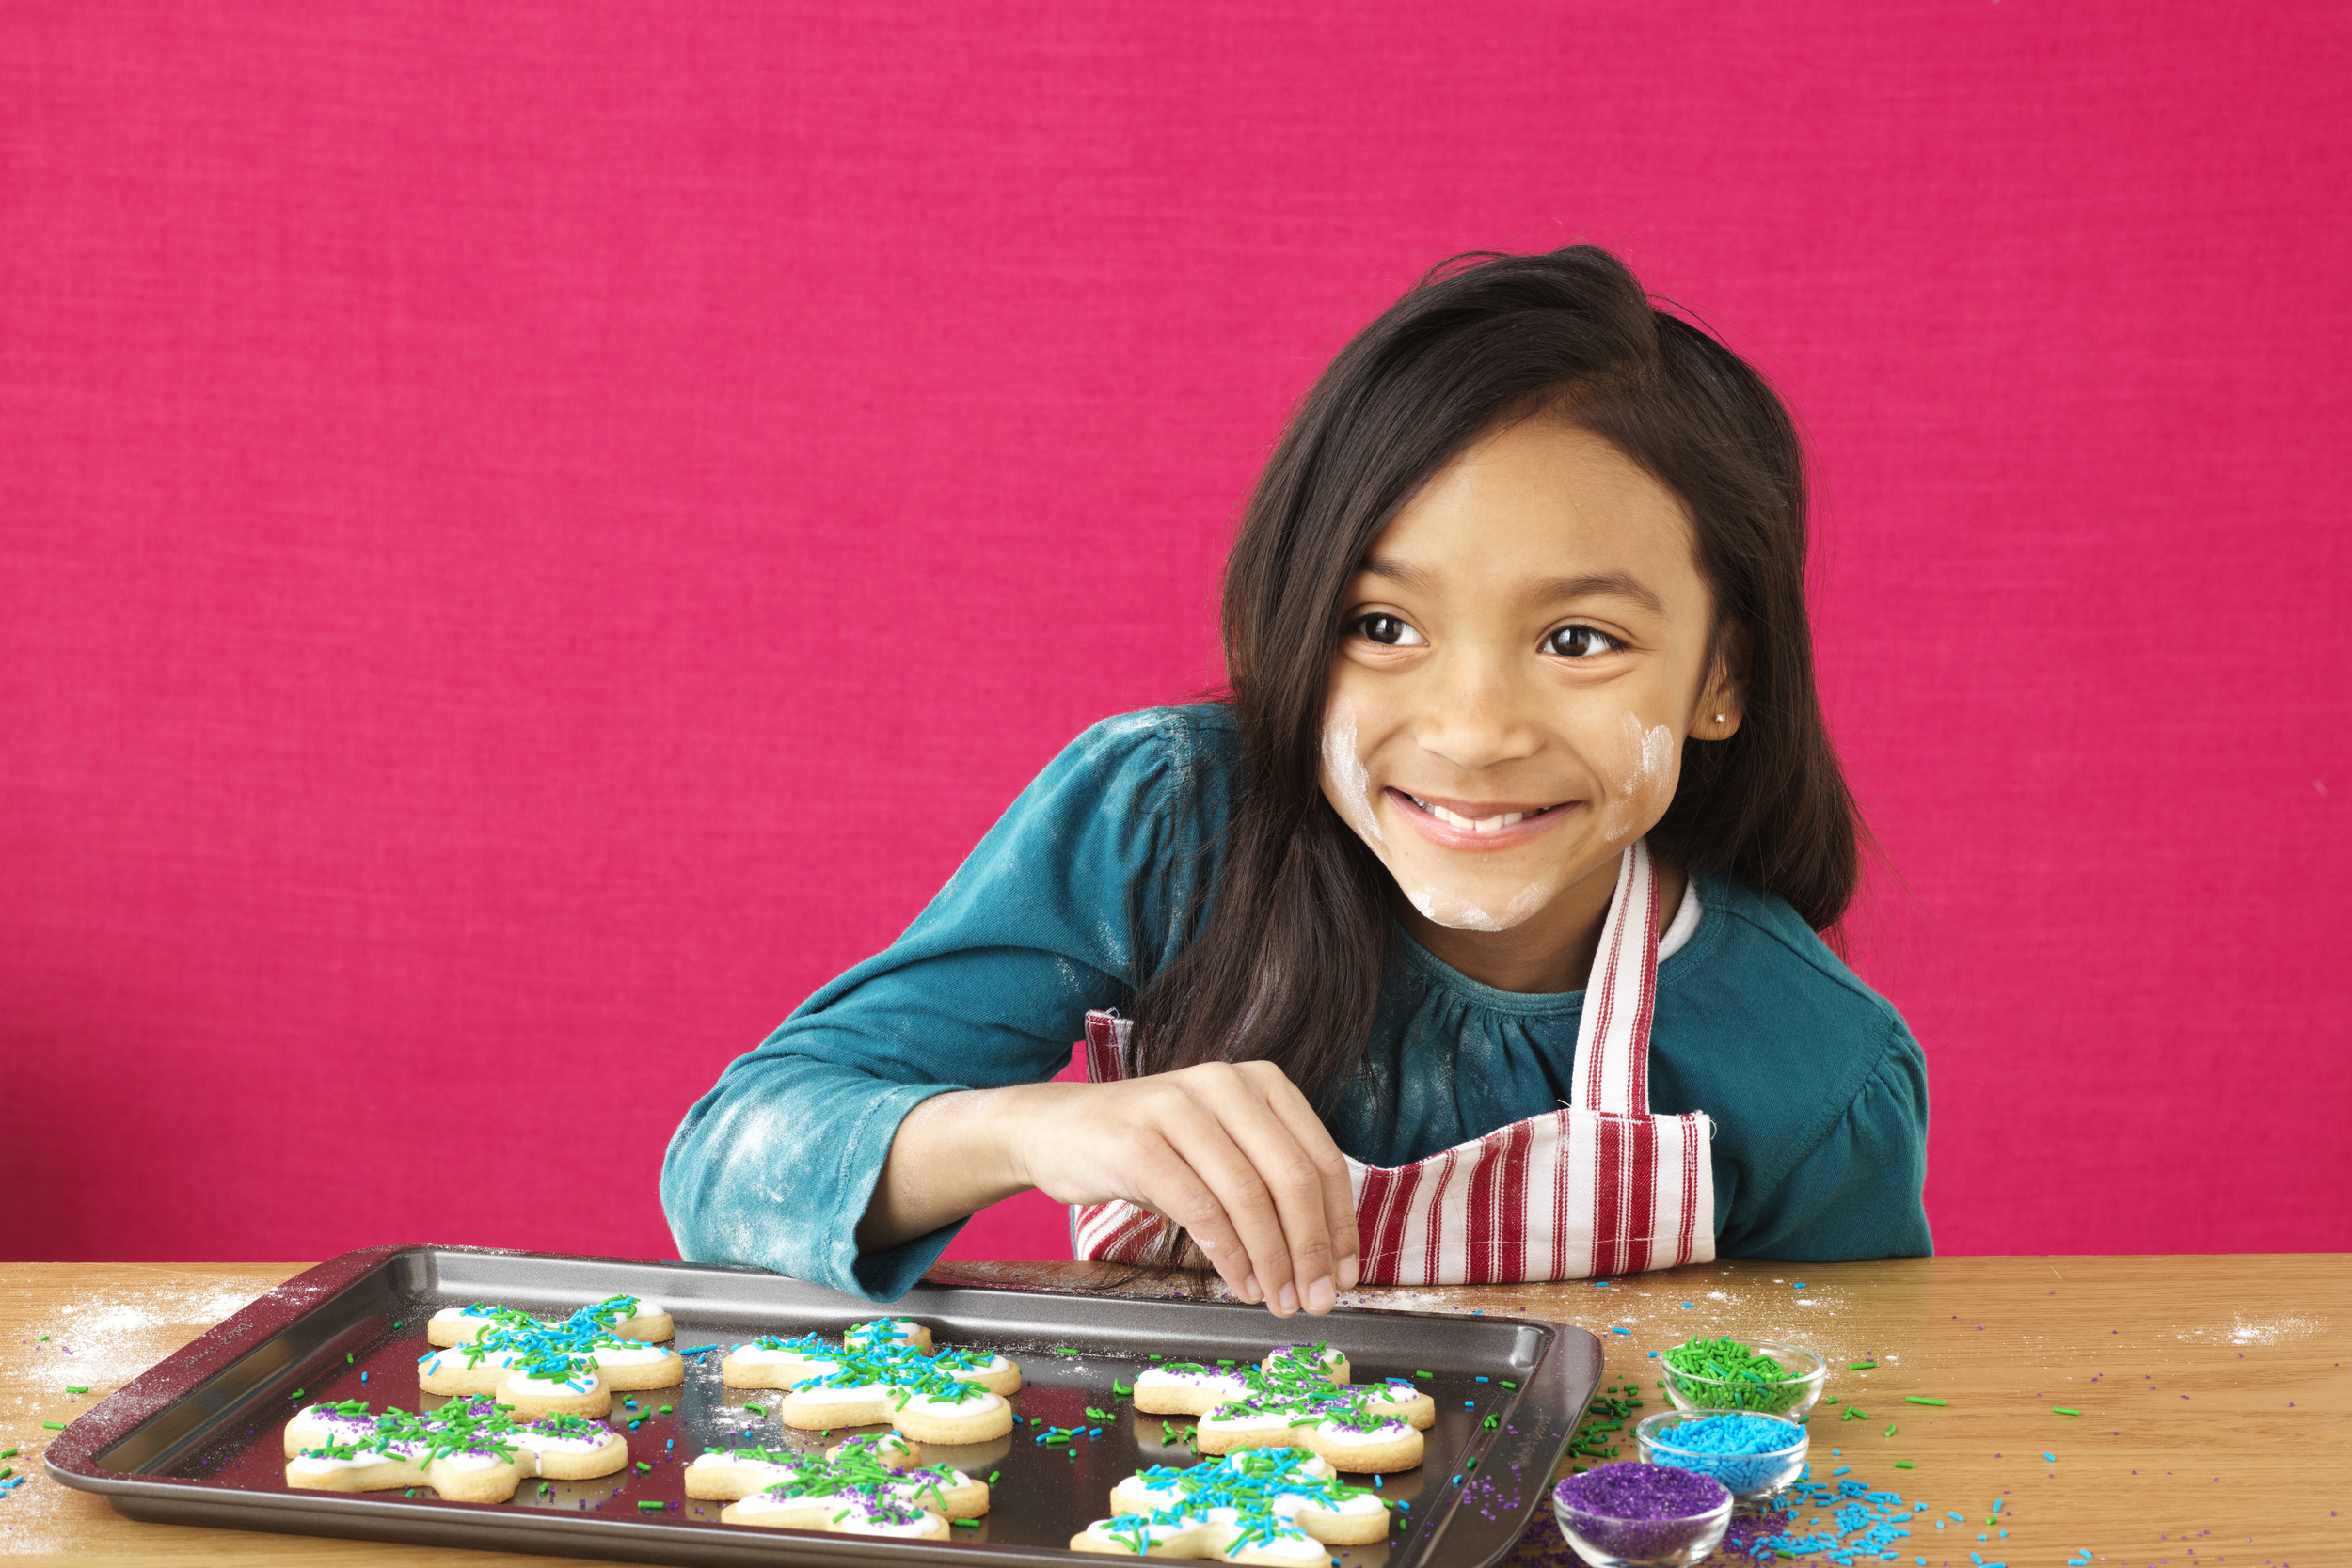 tr140113_WalGV_Day2_Cookies_0808.jpg